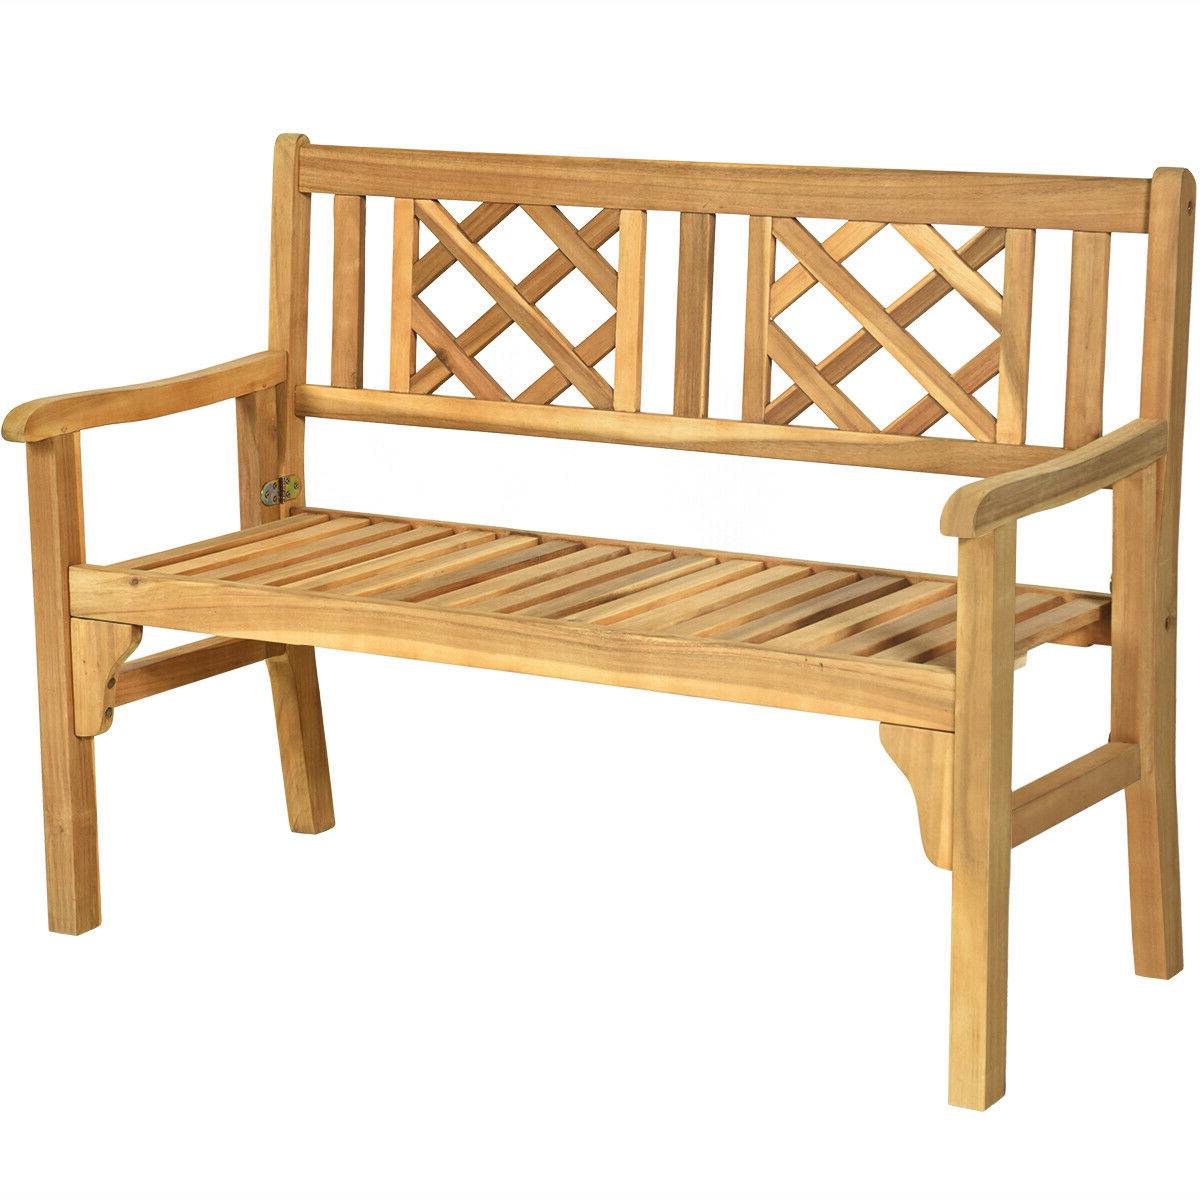 Hampstead Heath Teak Garden Benches Regarding Most Current Patio Outdoor Acacia Wood Bench Folding Loveseat Chair Garden Furniture Teak (View 7 of 30)